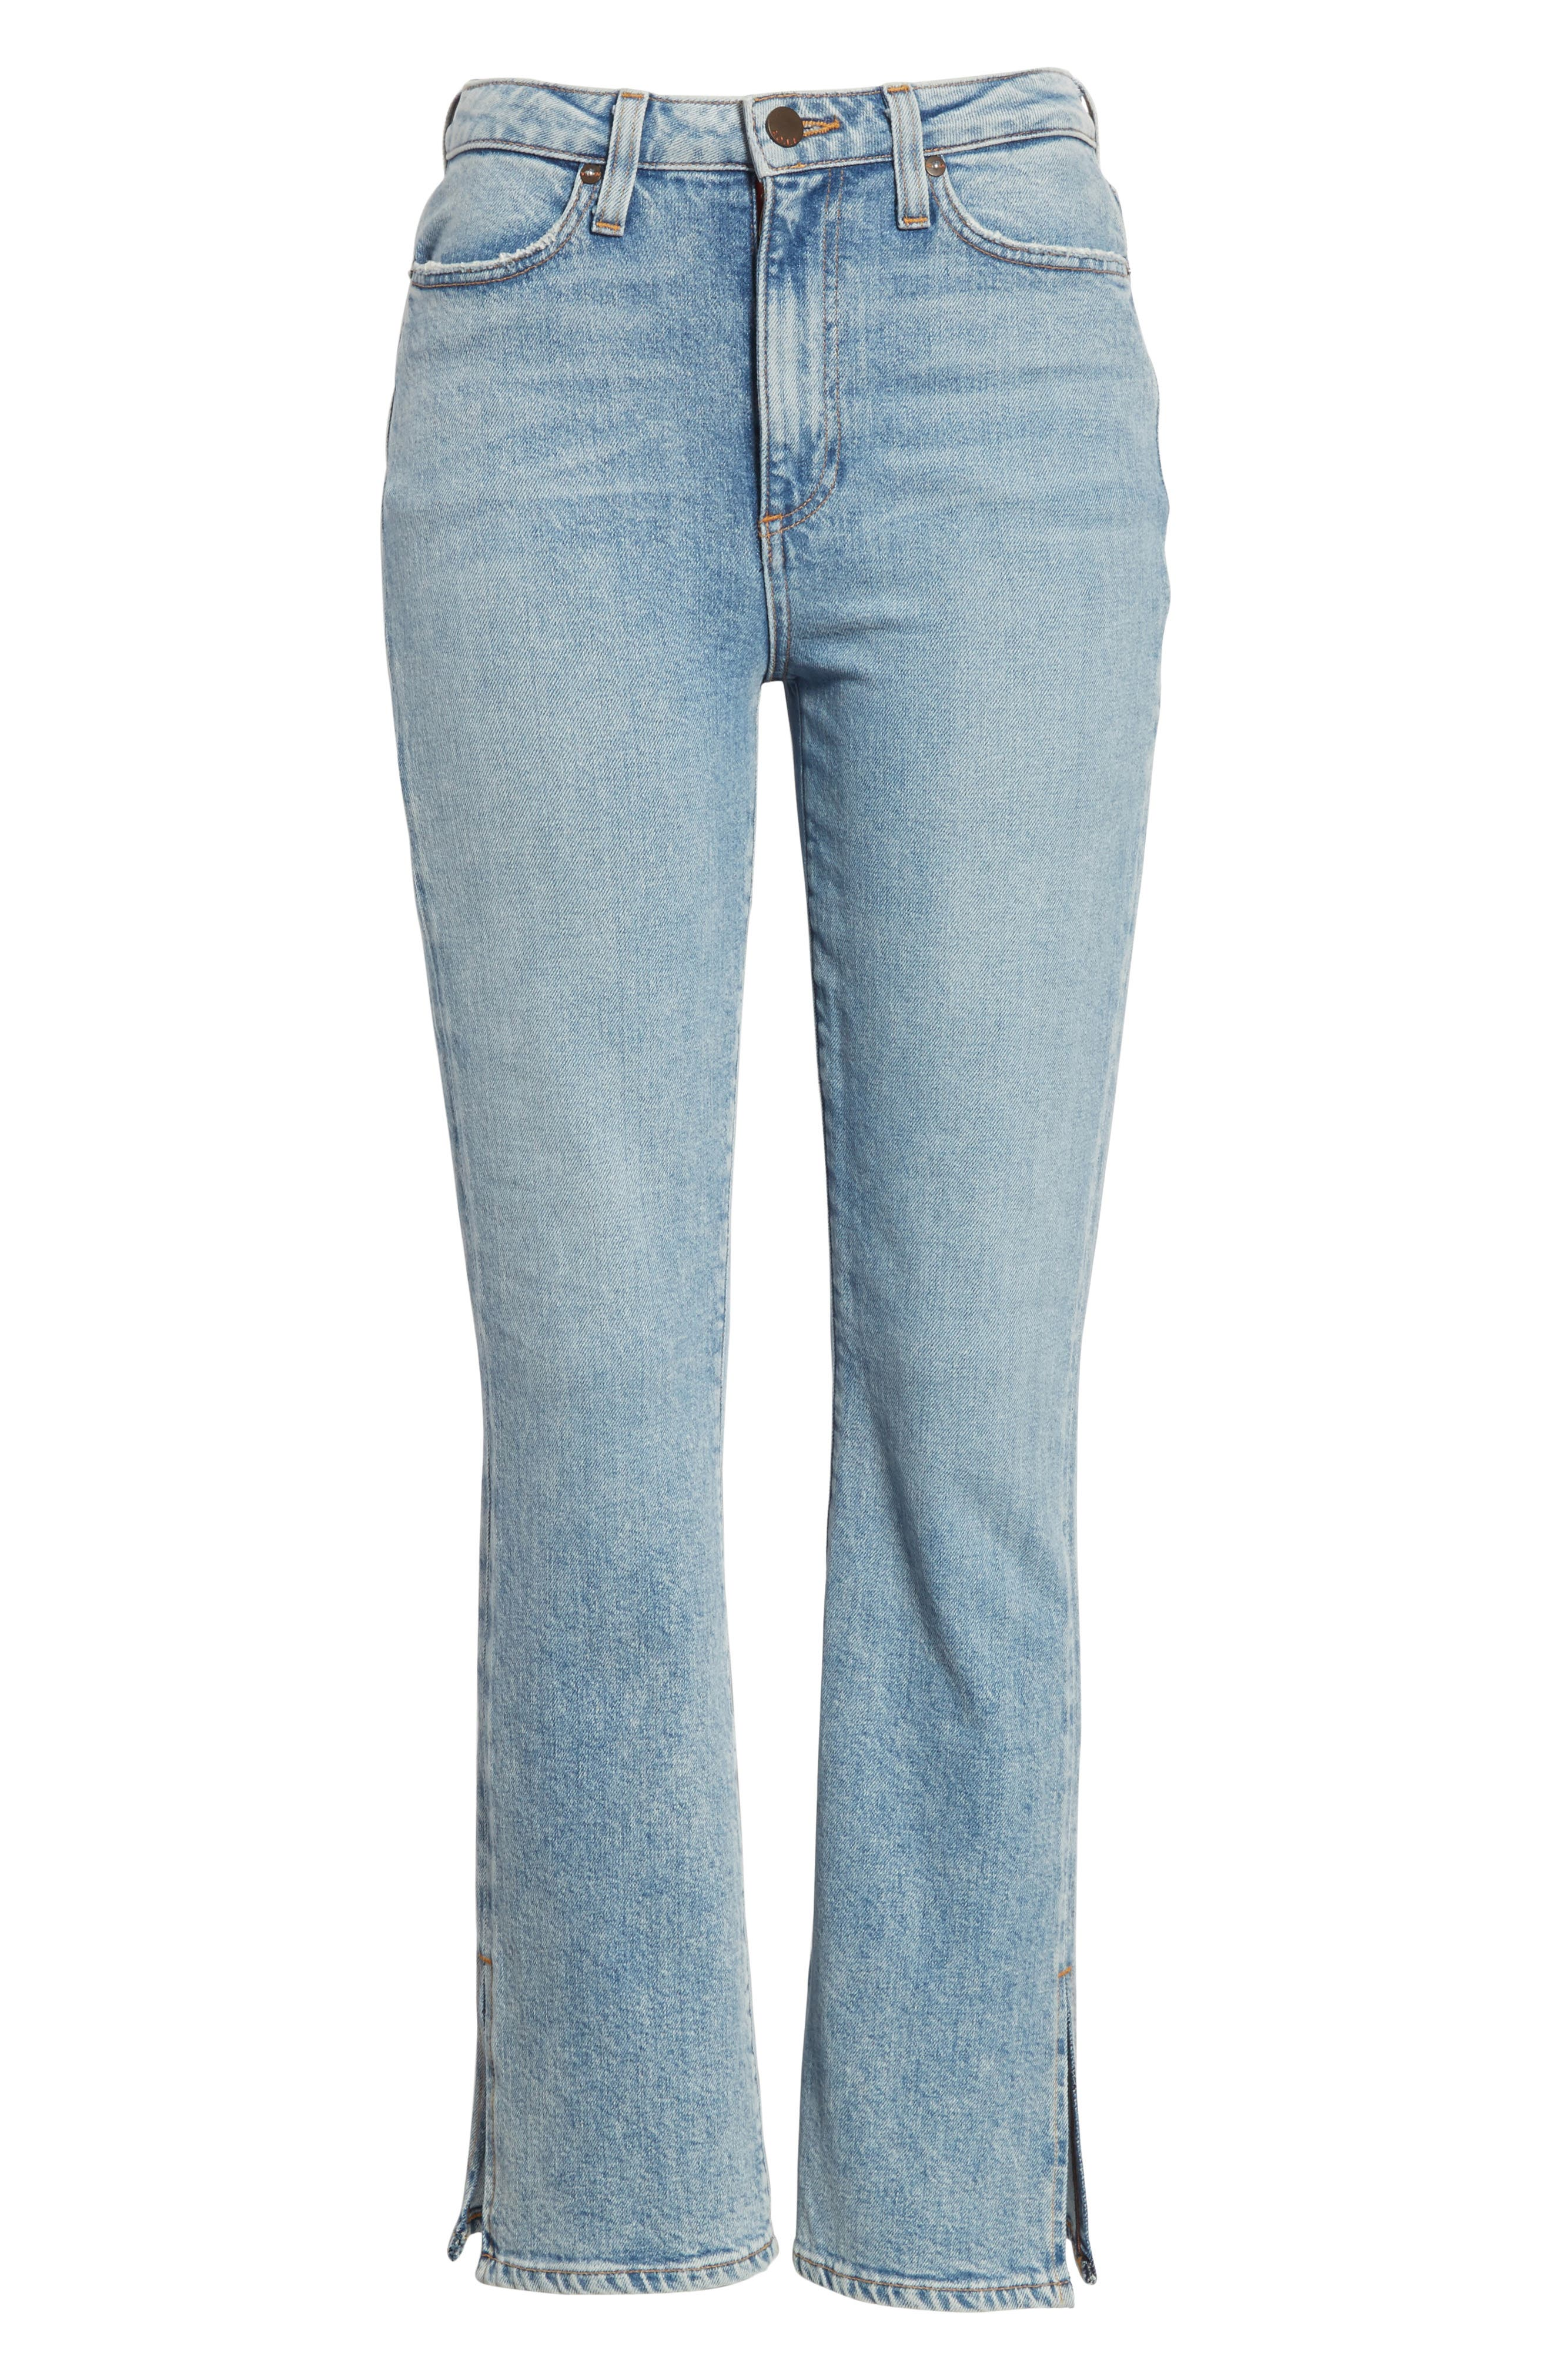 AO.LA Fabulous High Waist Baby Bootcut Jeans,                             Alternate thumbnail 6, color,